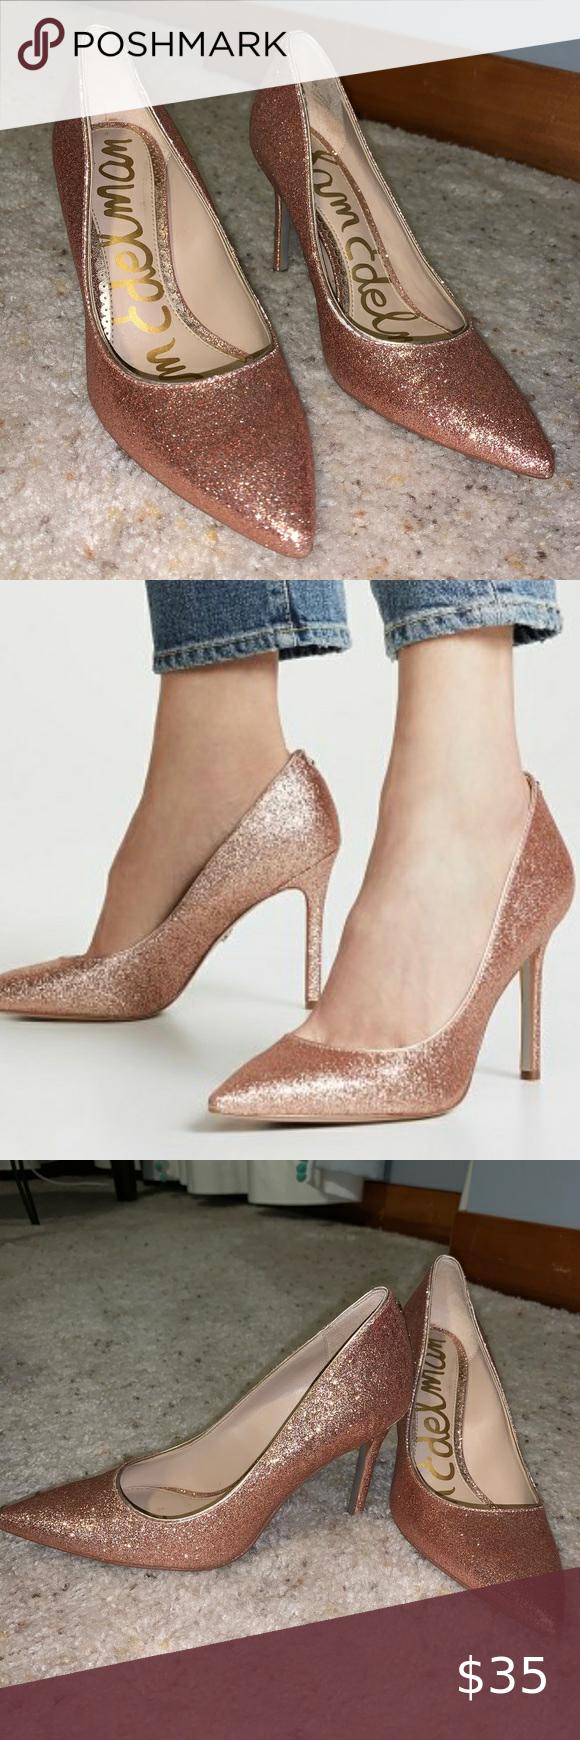 Sam Edelman Hazel/rose gold sparkly